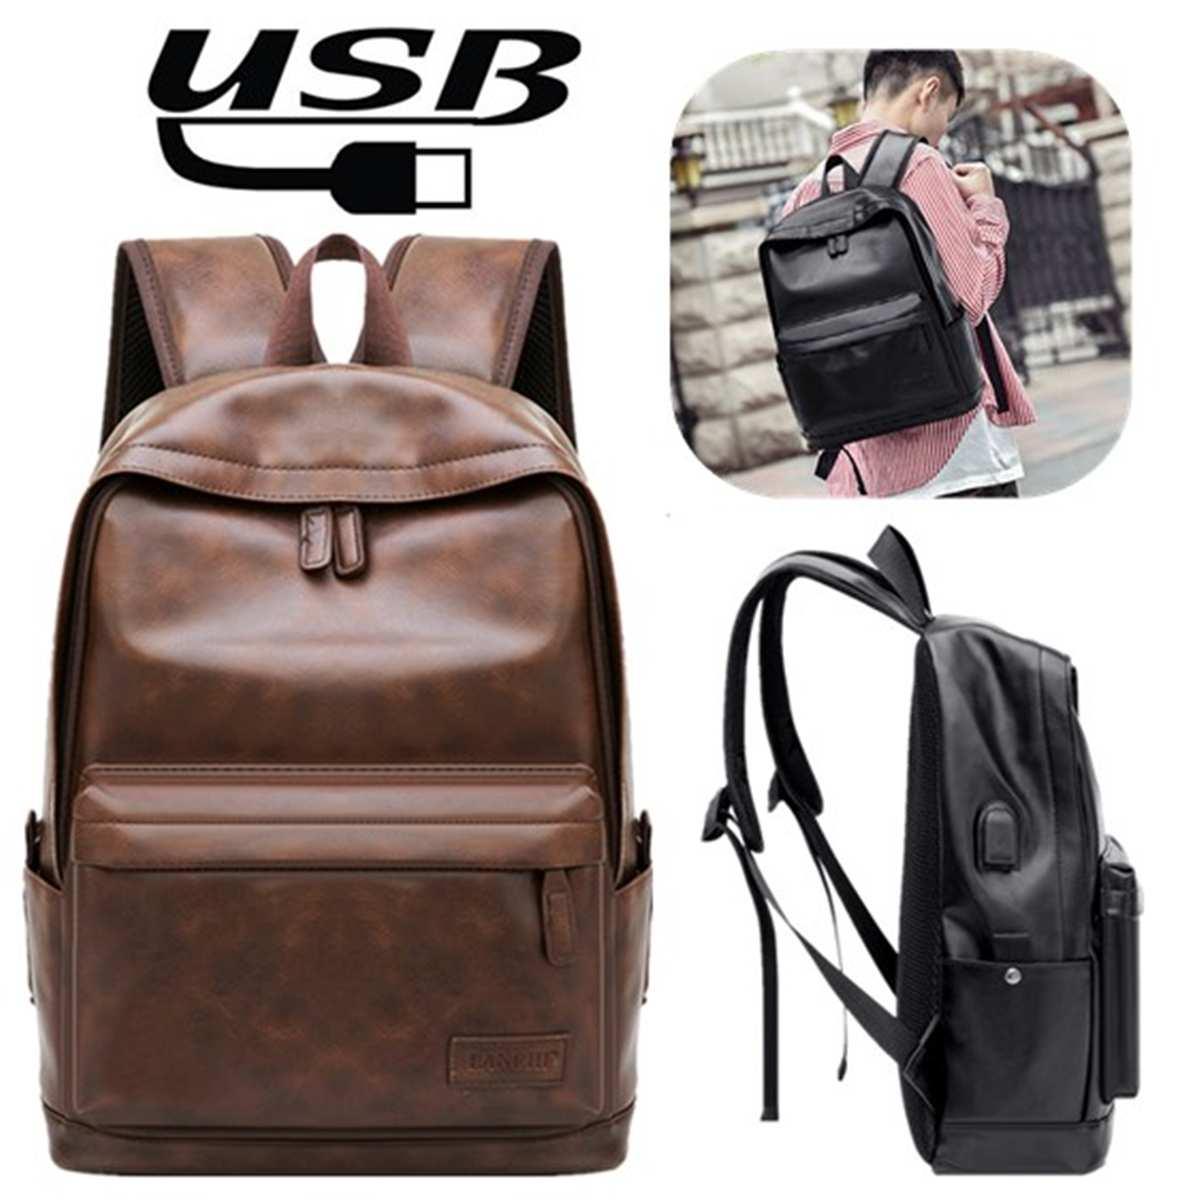 Men USB Backpack Waterproof Back Pack Fashion PU Leather Travel Bag Casual Black School Bag Leather Bookbag Feminine Mochila